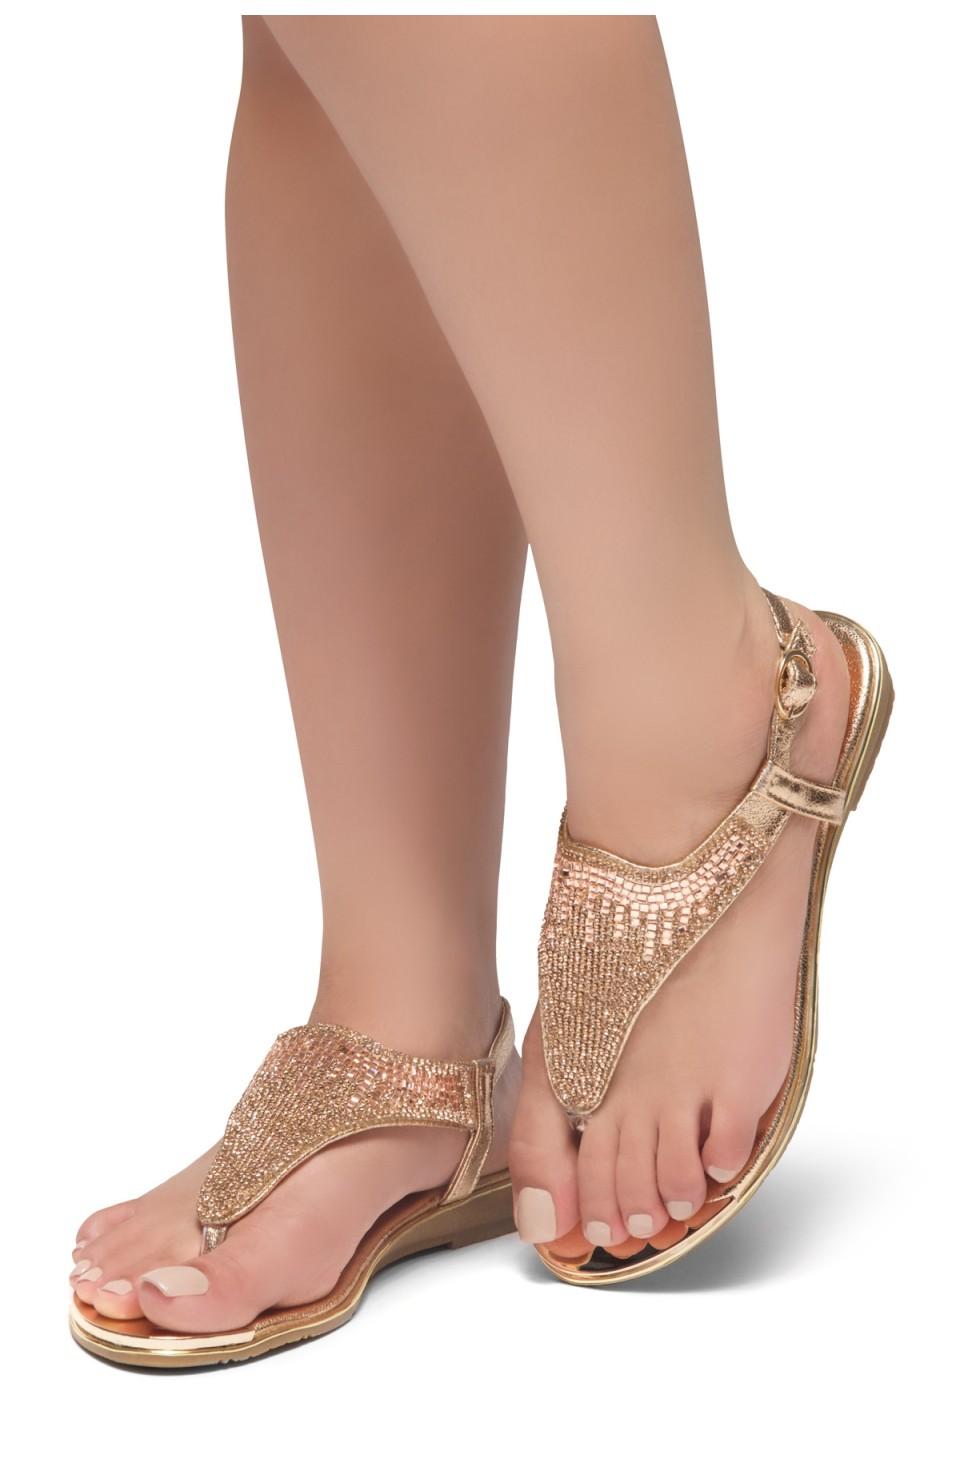 HerStyle COSMIC LOVE-Rhinestone Details Vamp, Open Toe, Flat Sandals (RoseGold)